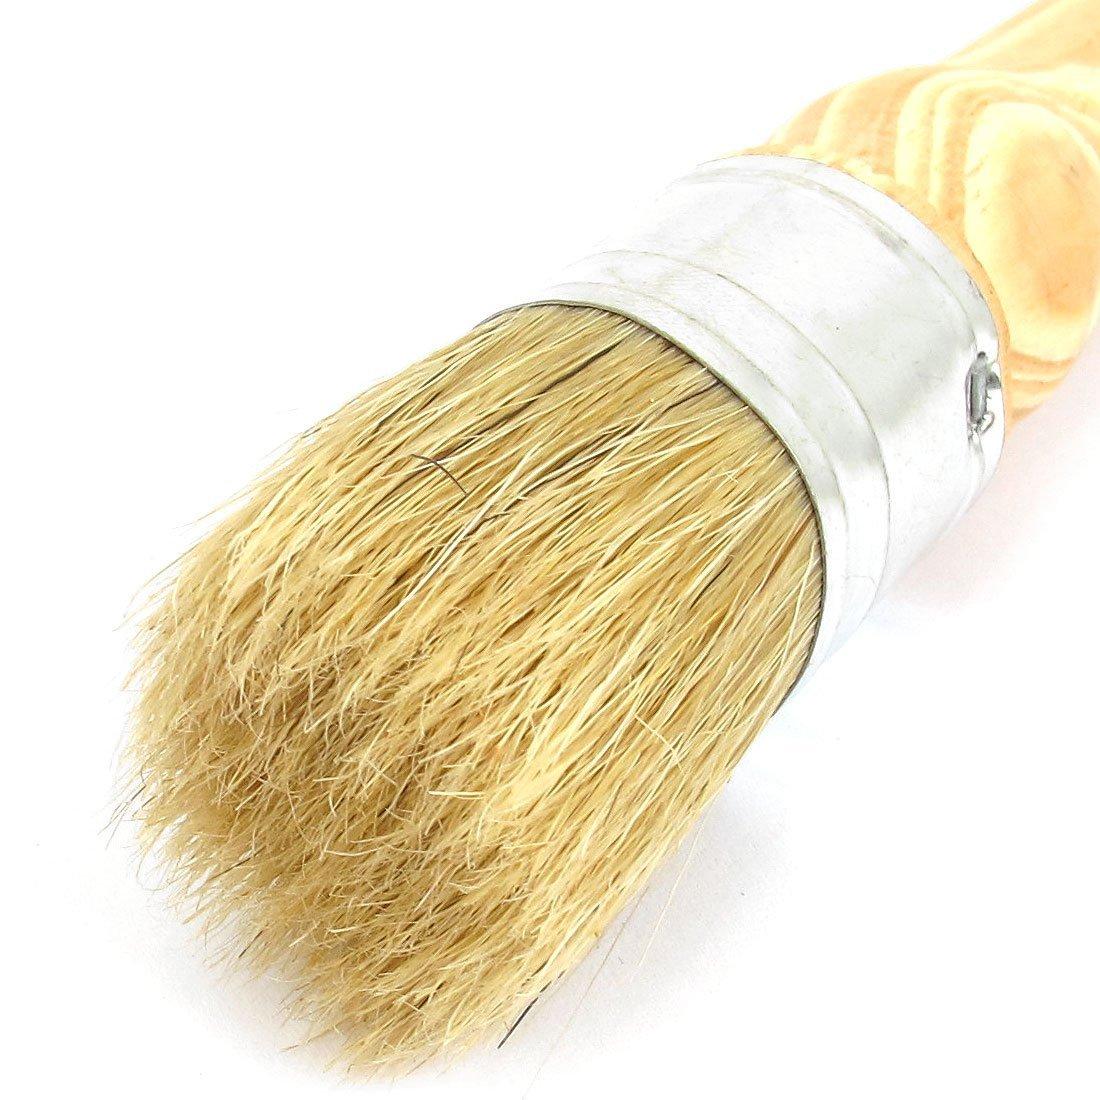 DealMux 30mm Dia Round Bristle Chalk Oil Paint Painting Wax Brush